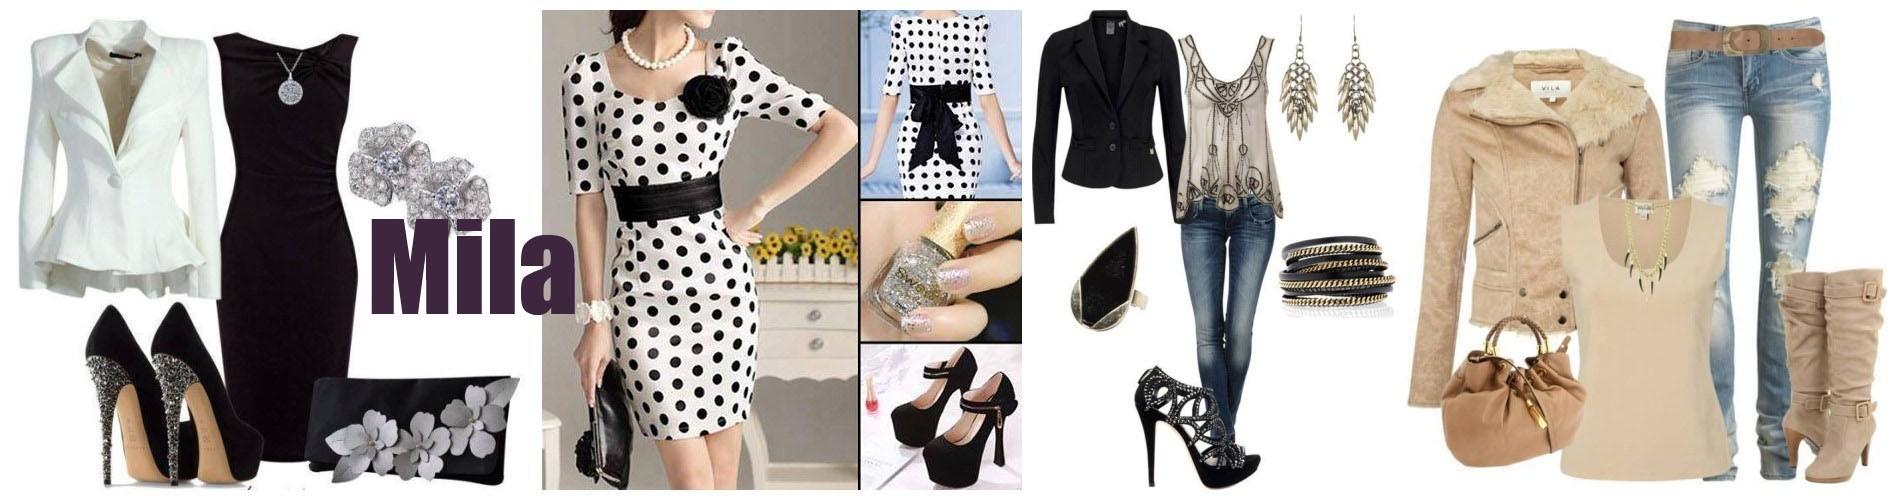 Black dress qoo10 - Black Dress Qoo10 13